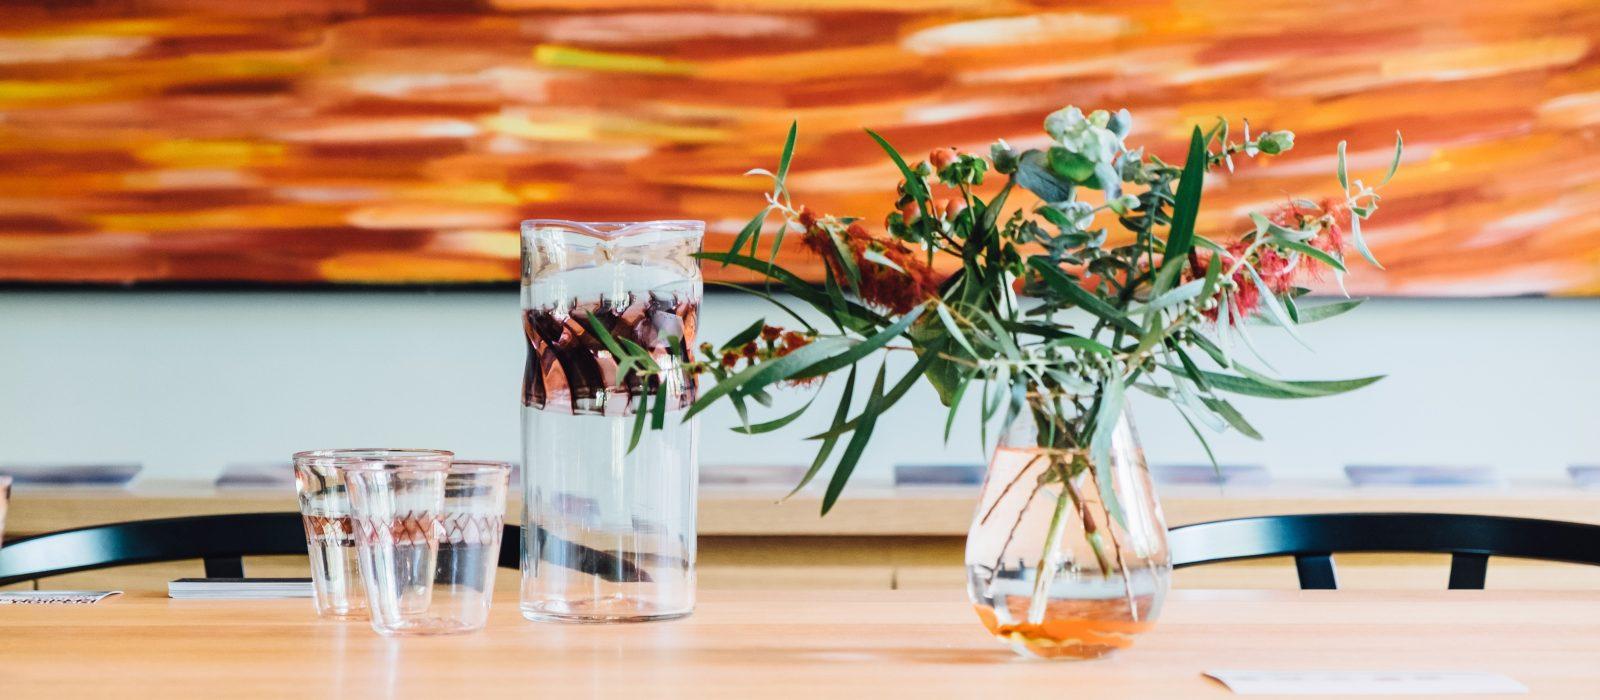 Rob Schwartz, Jug + Cups, Rose-Mary Faulkner, Posie Vase, Design Canberra Living Rooms 2017. Photo: Trang Arya.